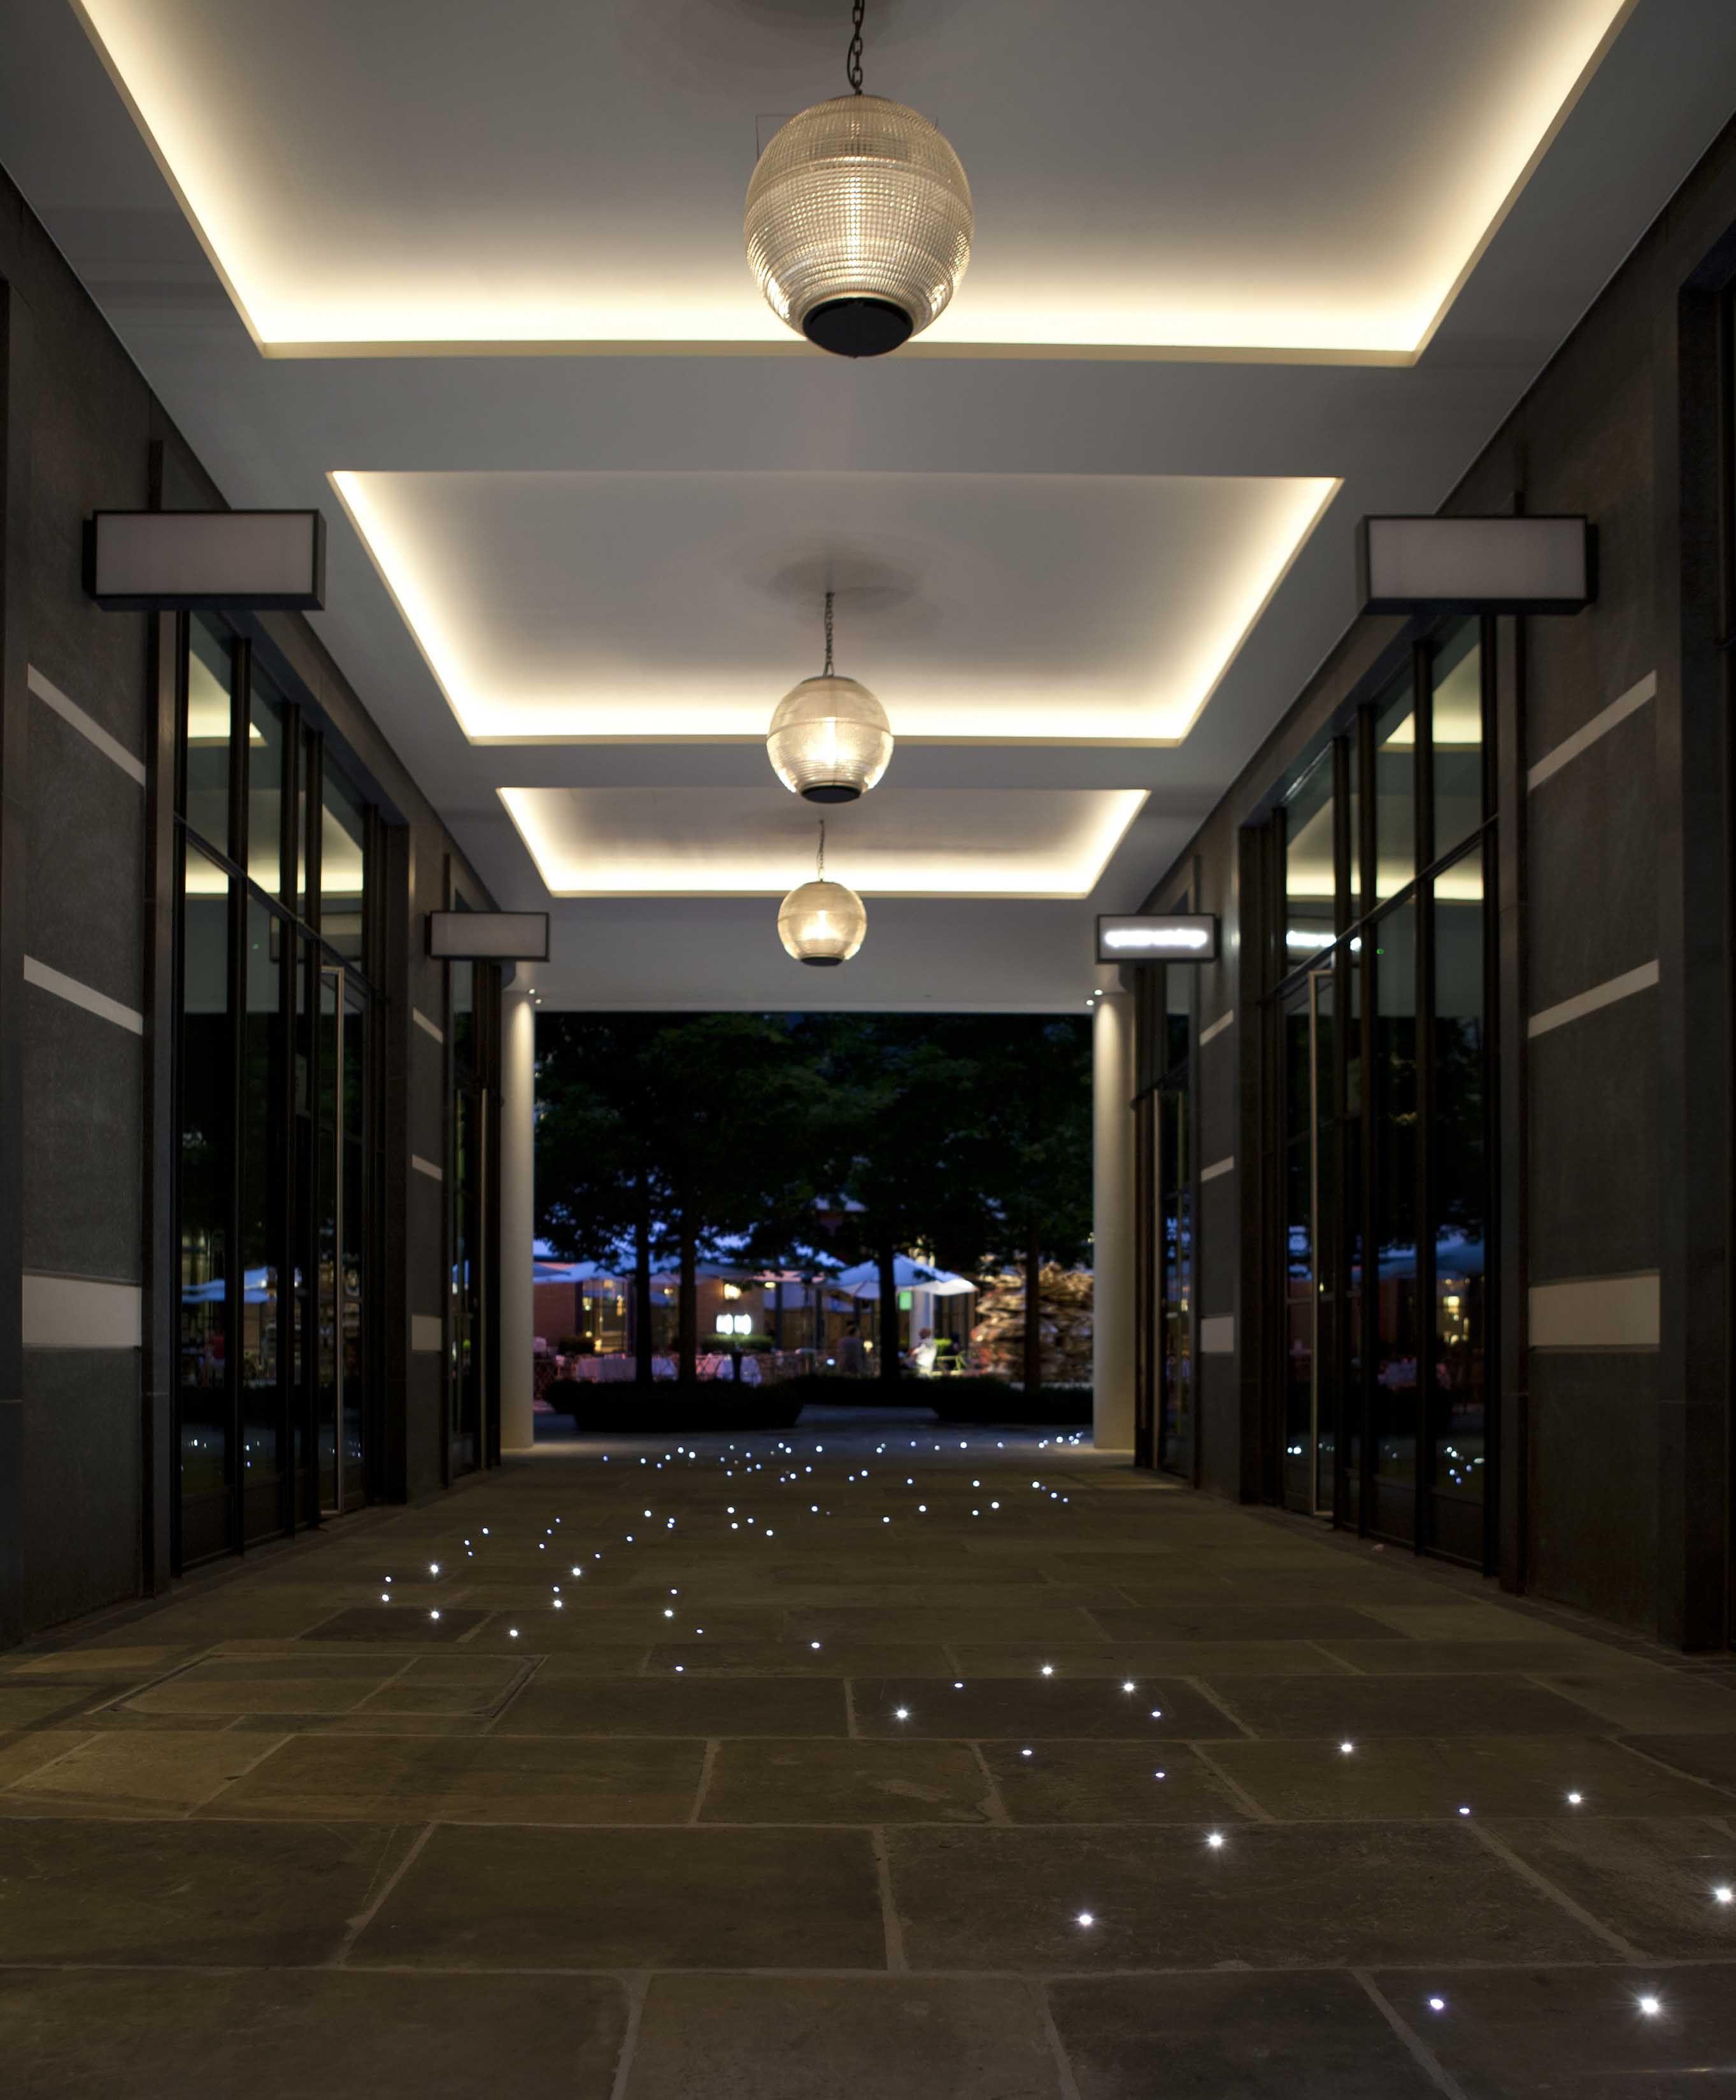 ham yard hotel lighting by lighting design international ilumina o pinterest light design. Black Bedroom Furniture Sets. Home Design Ideas